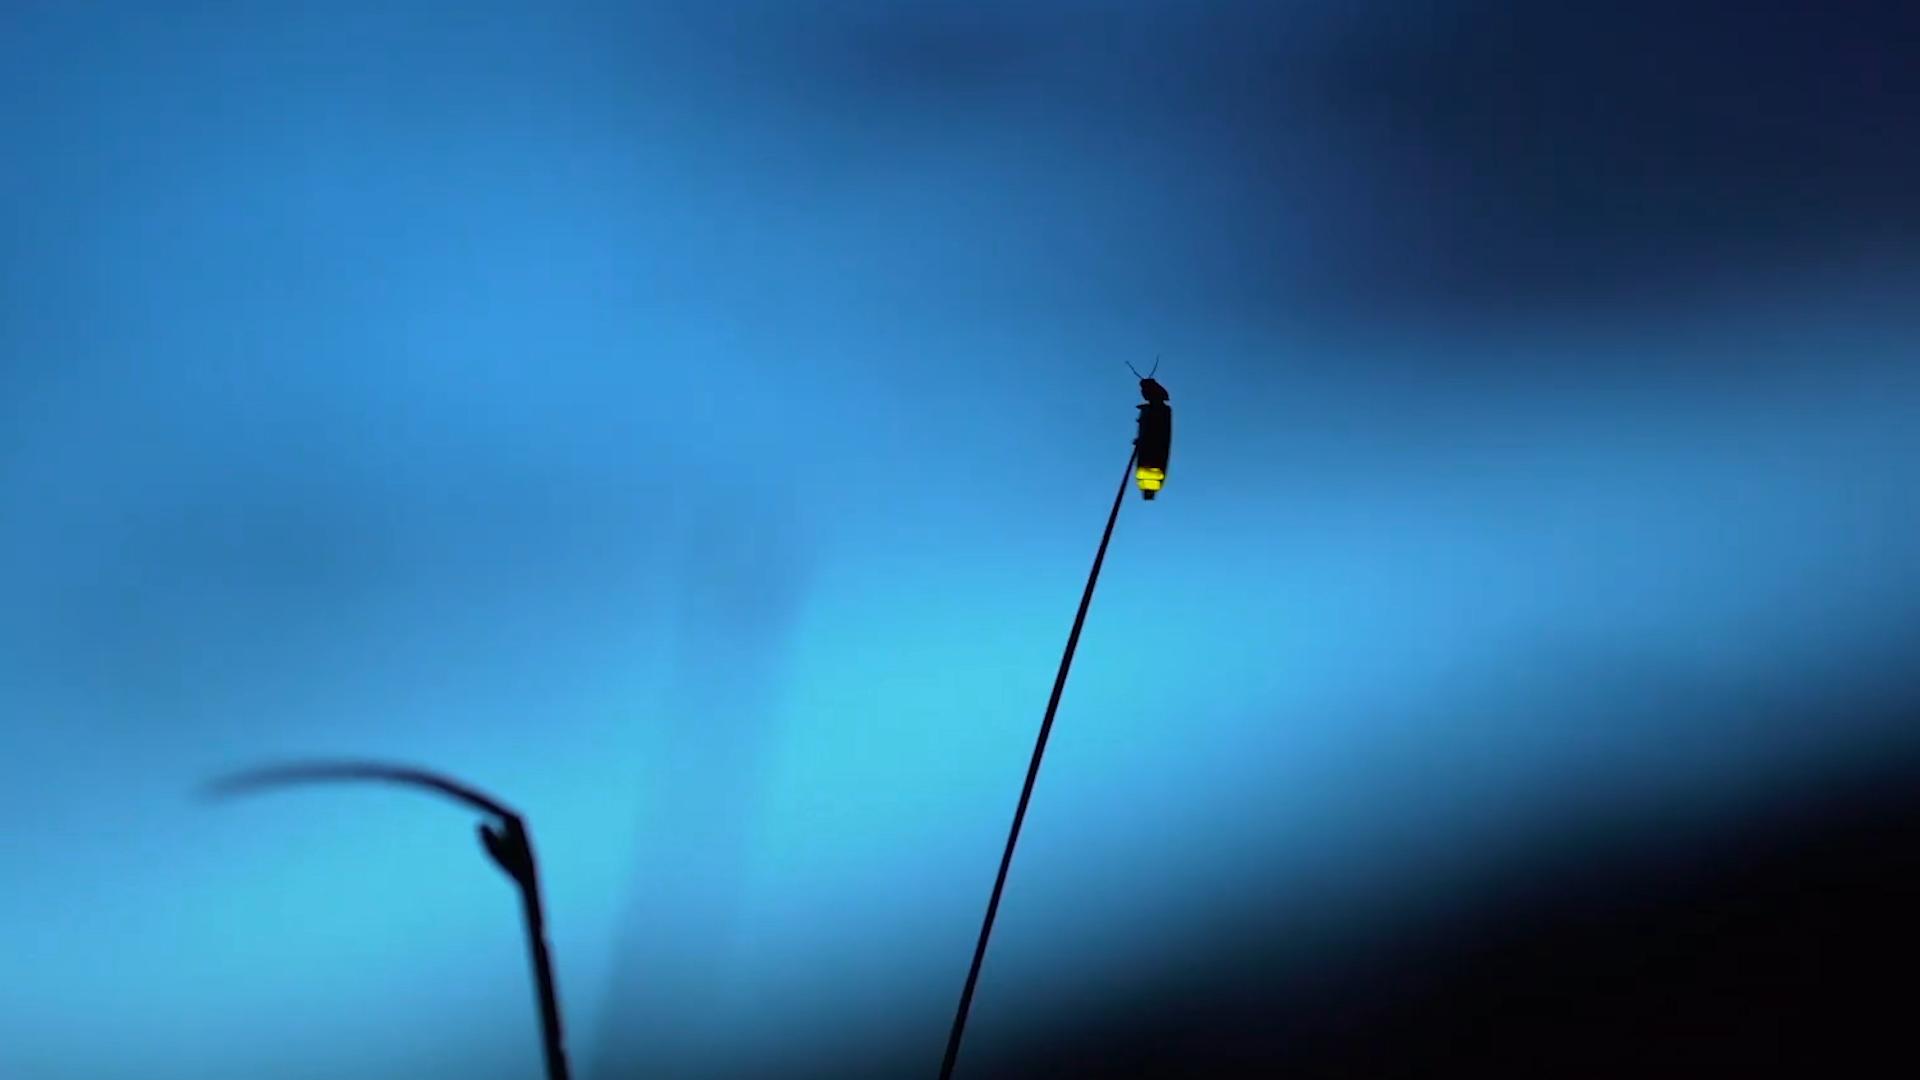 Family Traditions | Utah's Fireflies